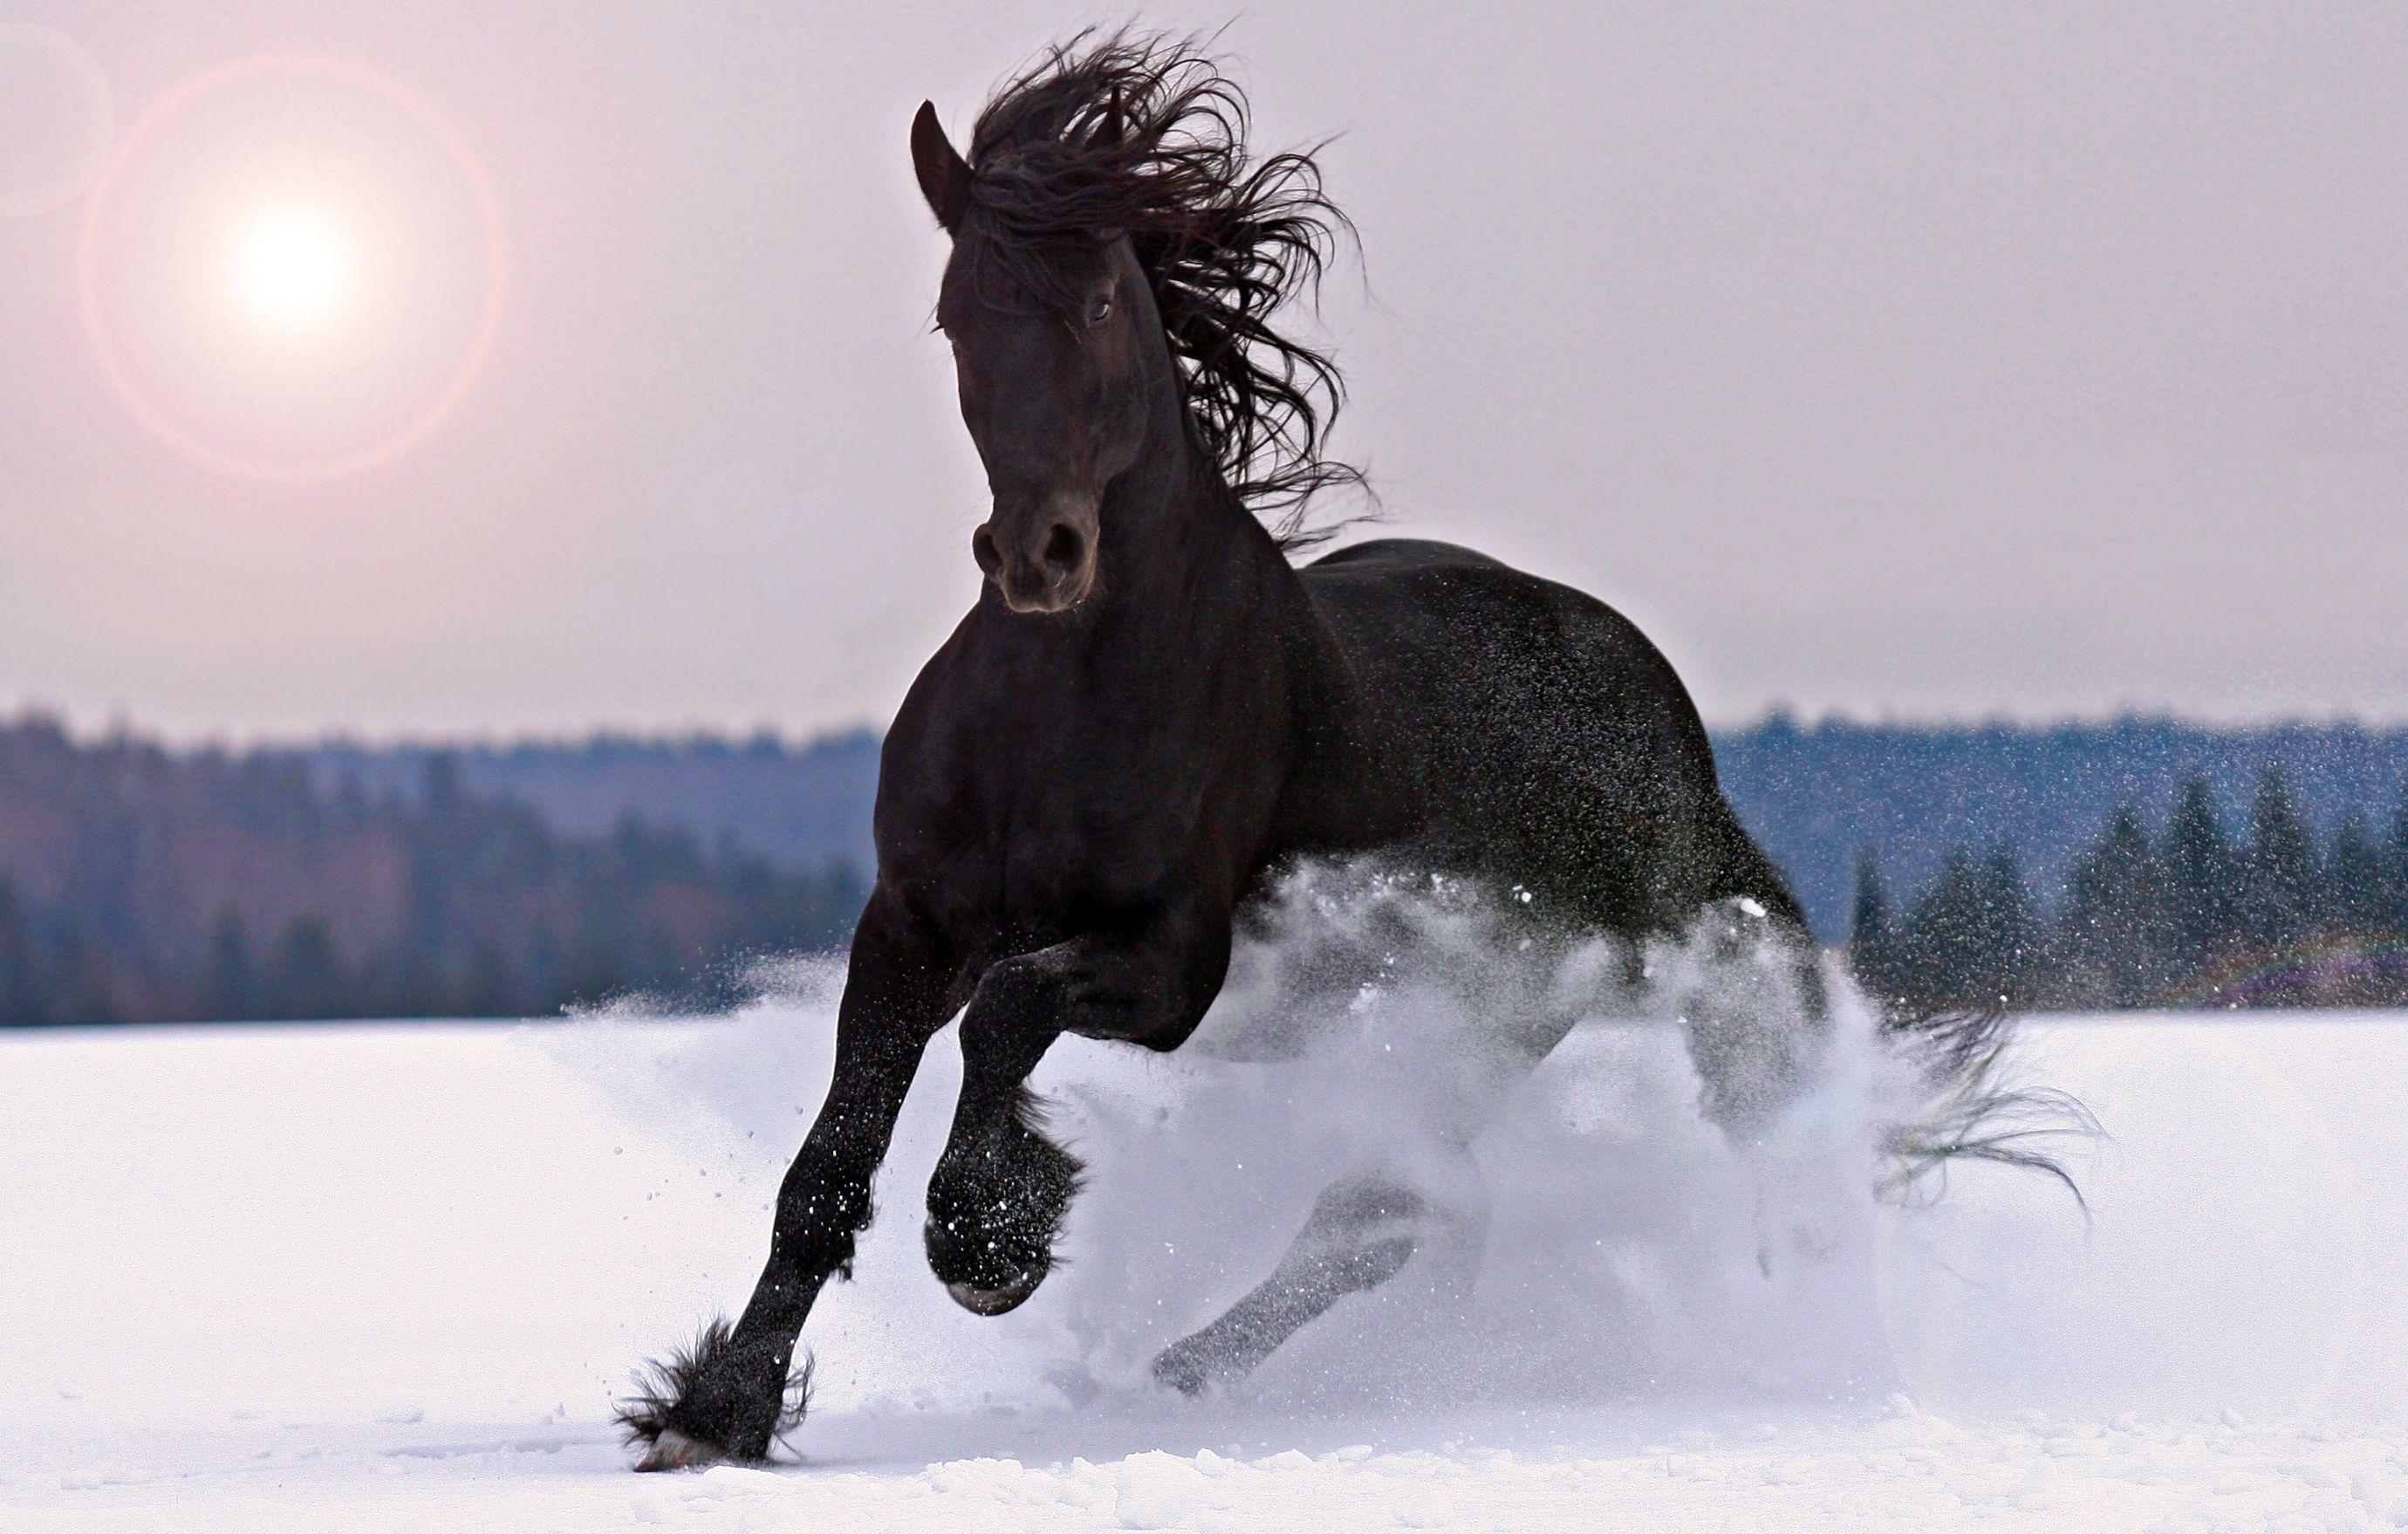 Amazing Wallpaper Horse Snow - 3e661391991cb42fb8959f7ae7ba2410  Collection_59871.jpg